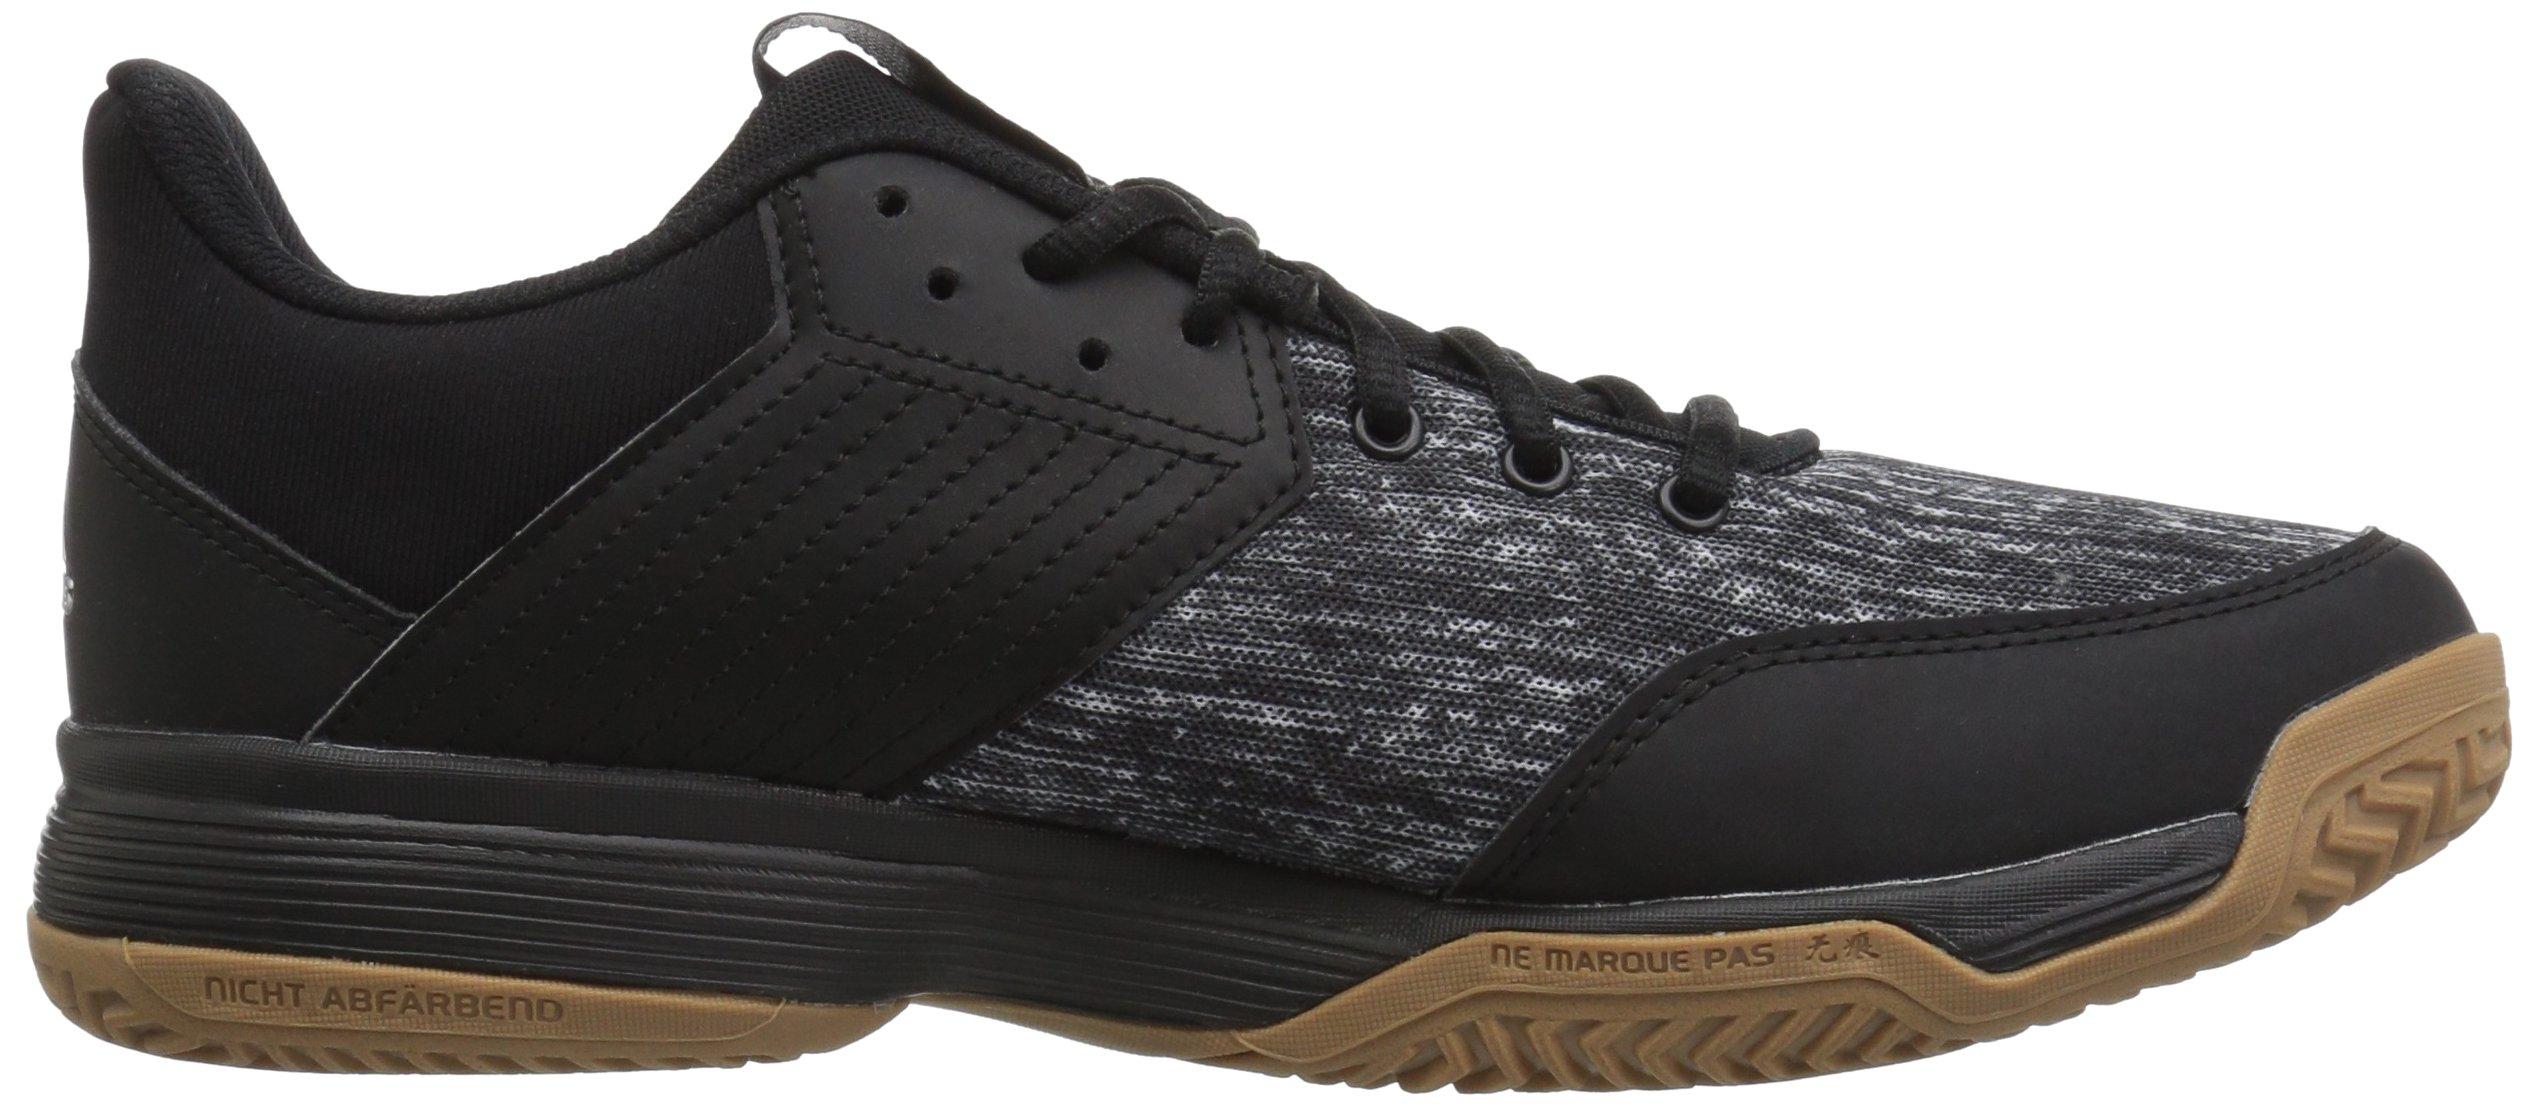 adidas Women's Ligra 6 Volleyball Shoe, Black/Silver Metallic/White, 7 M US by adidas (Image #6)